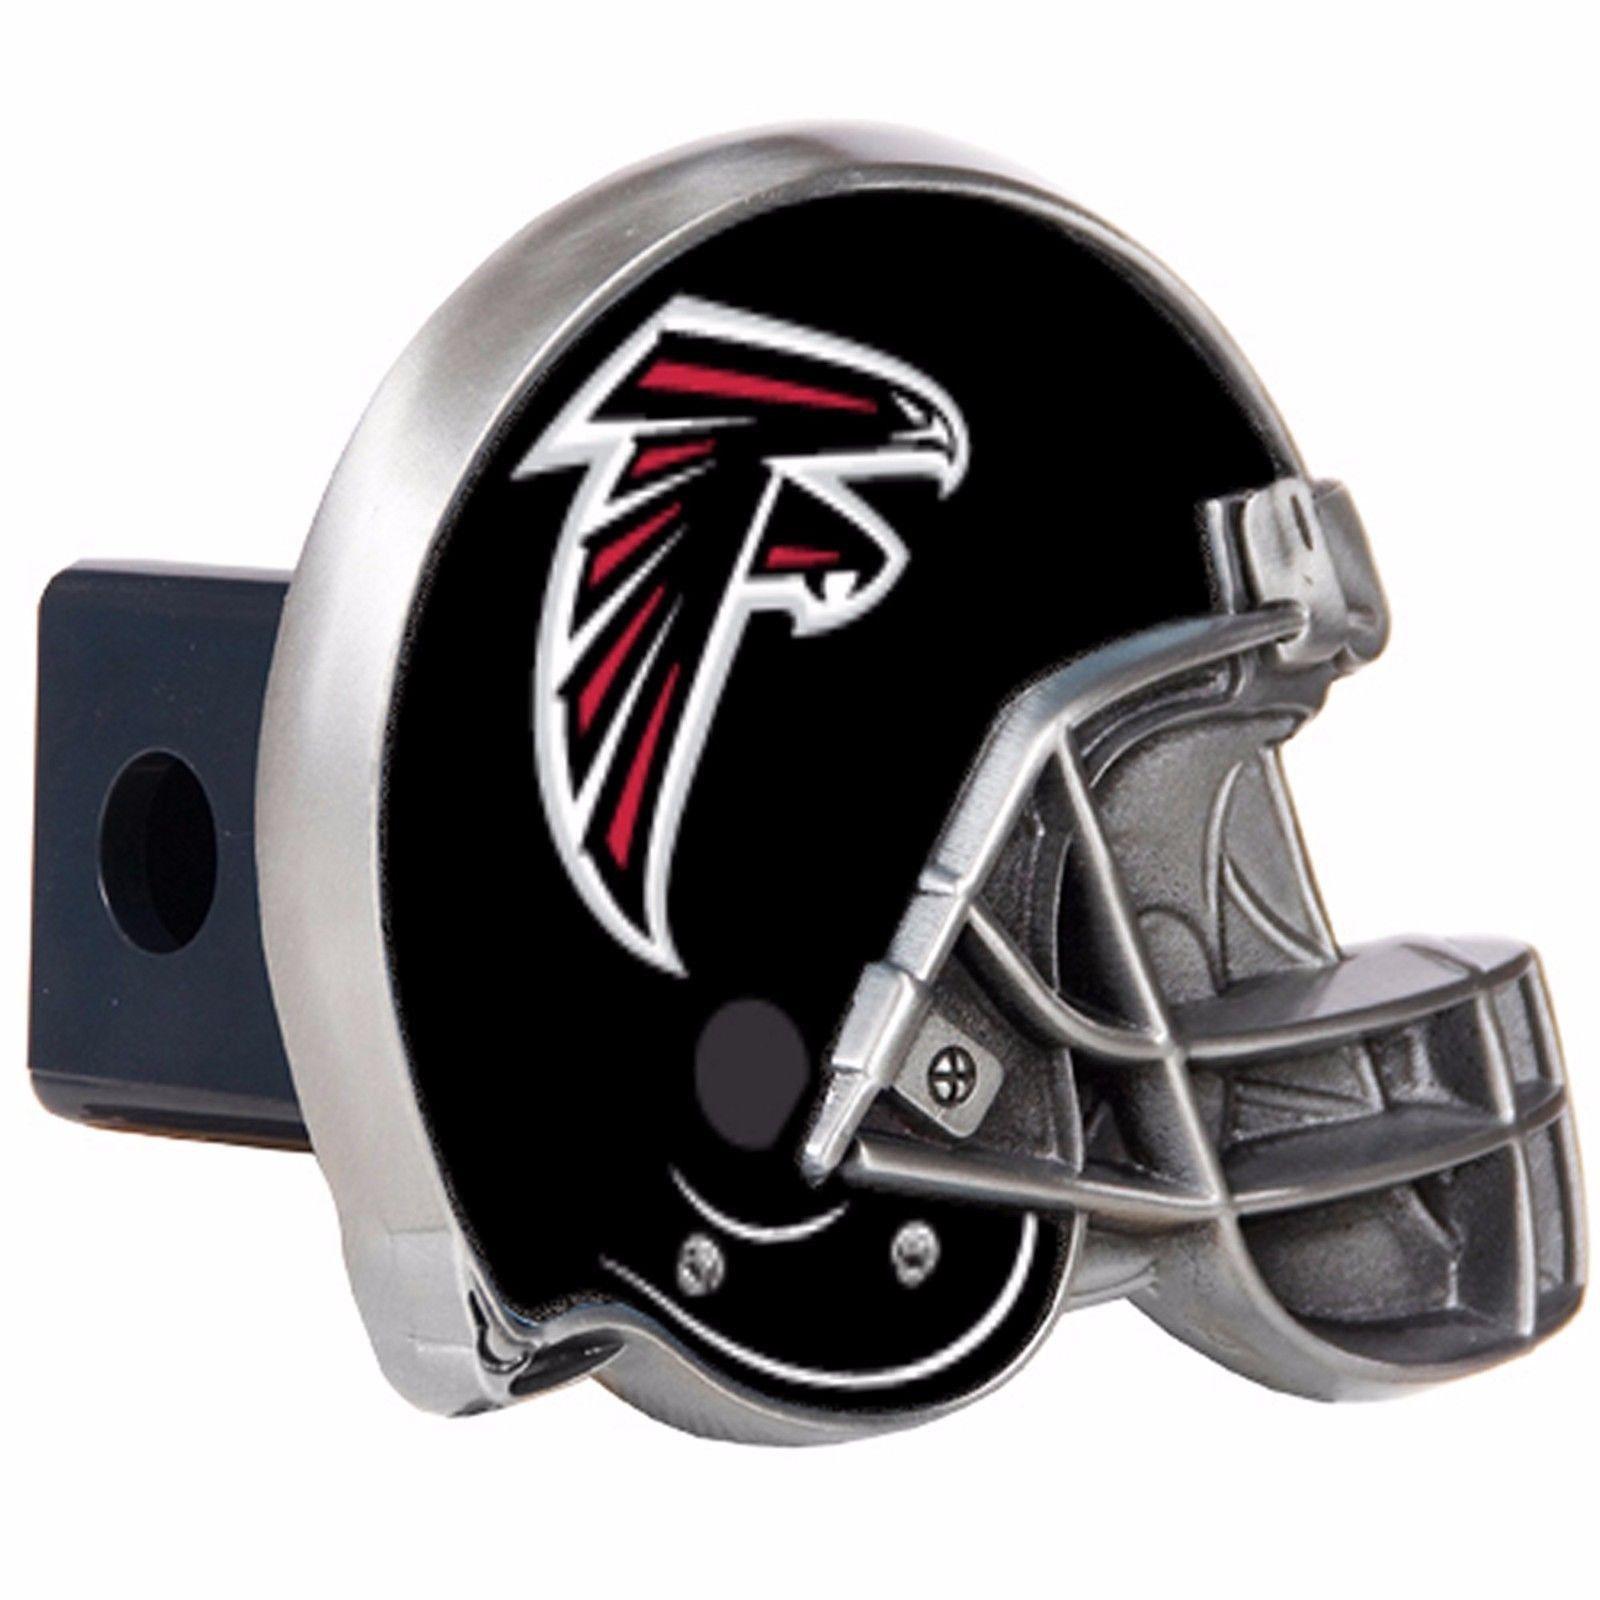 Atlanta Falcons Helmet Trailer Hitch Cover Nfl Multi Color Chicago Bears Helmet Football Helmets Atlanta Falcons Helmet